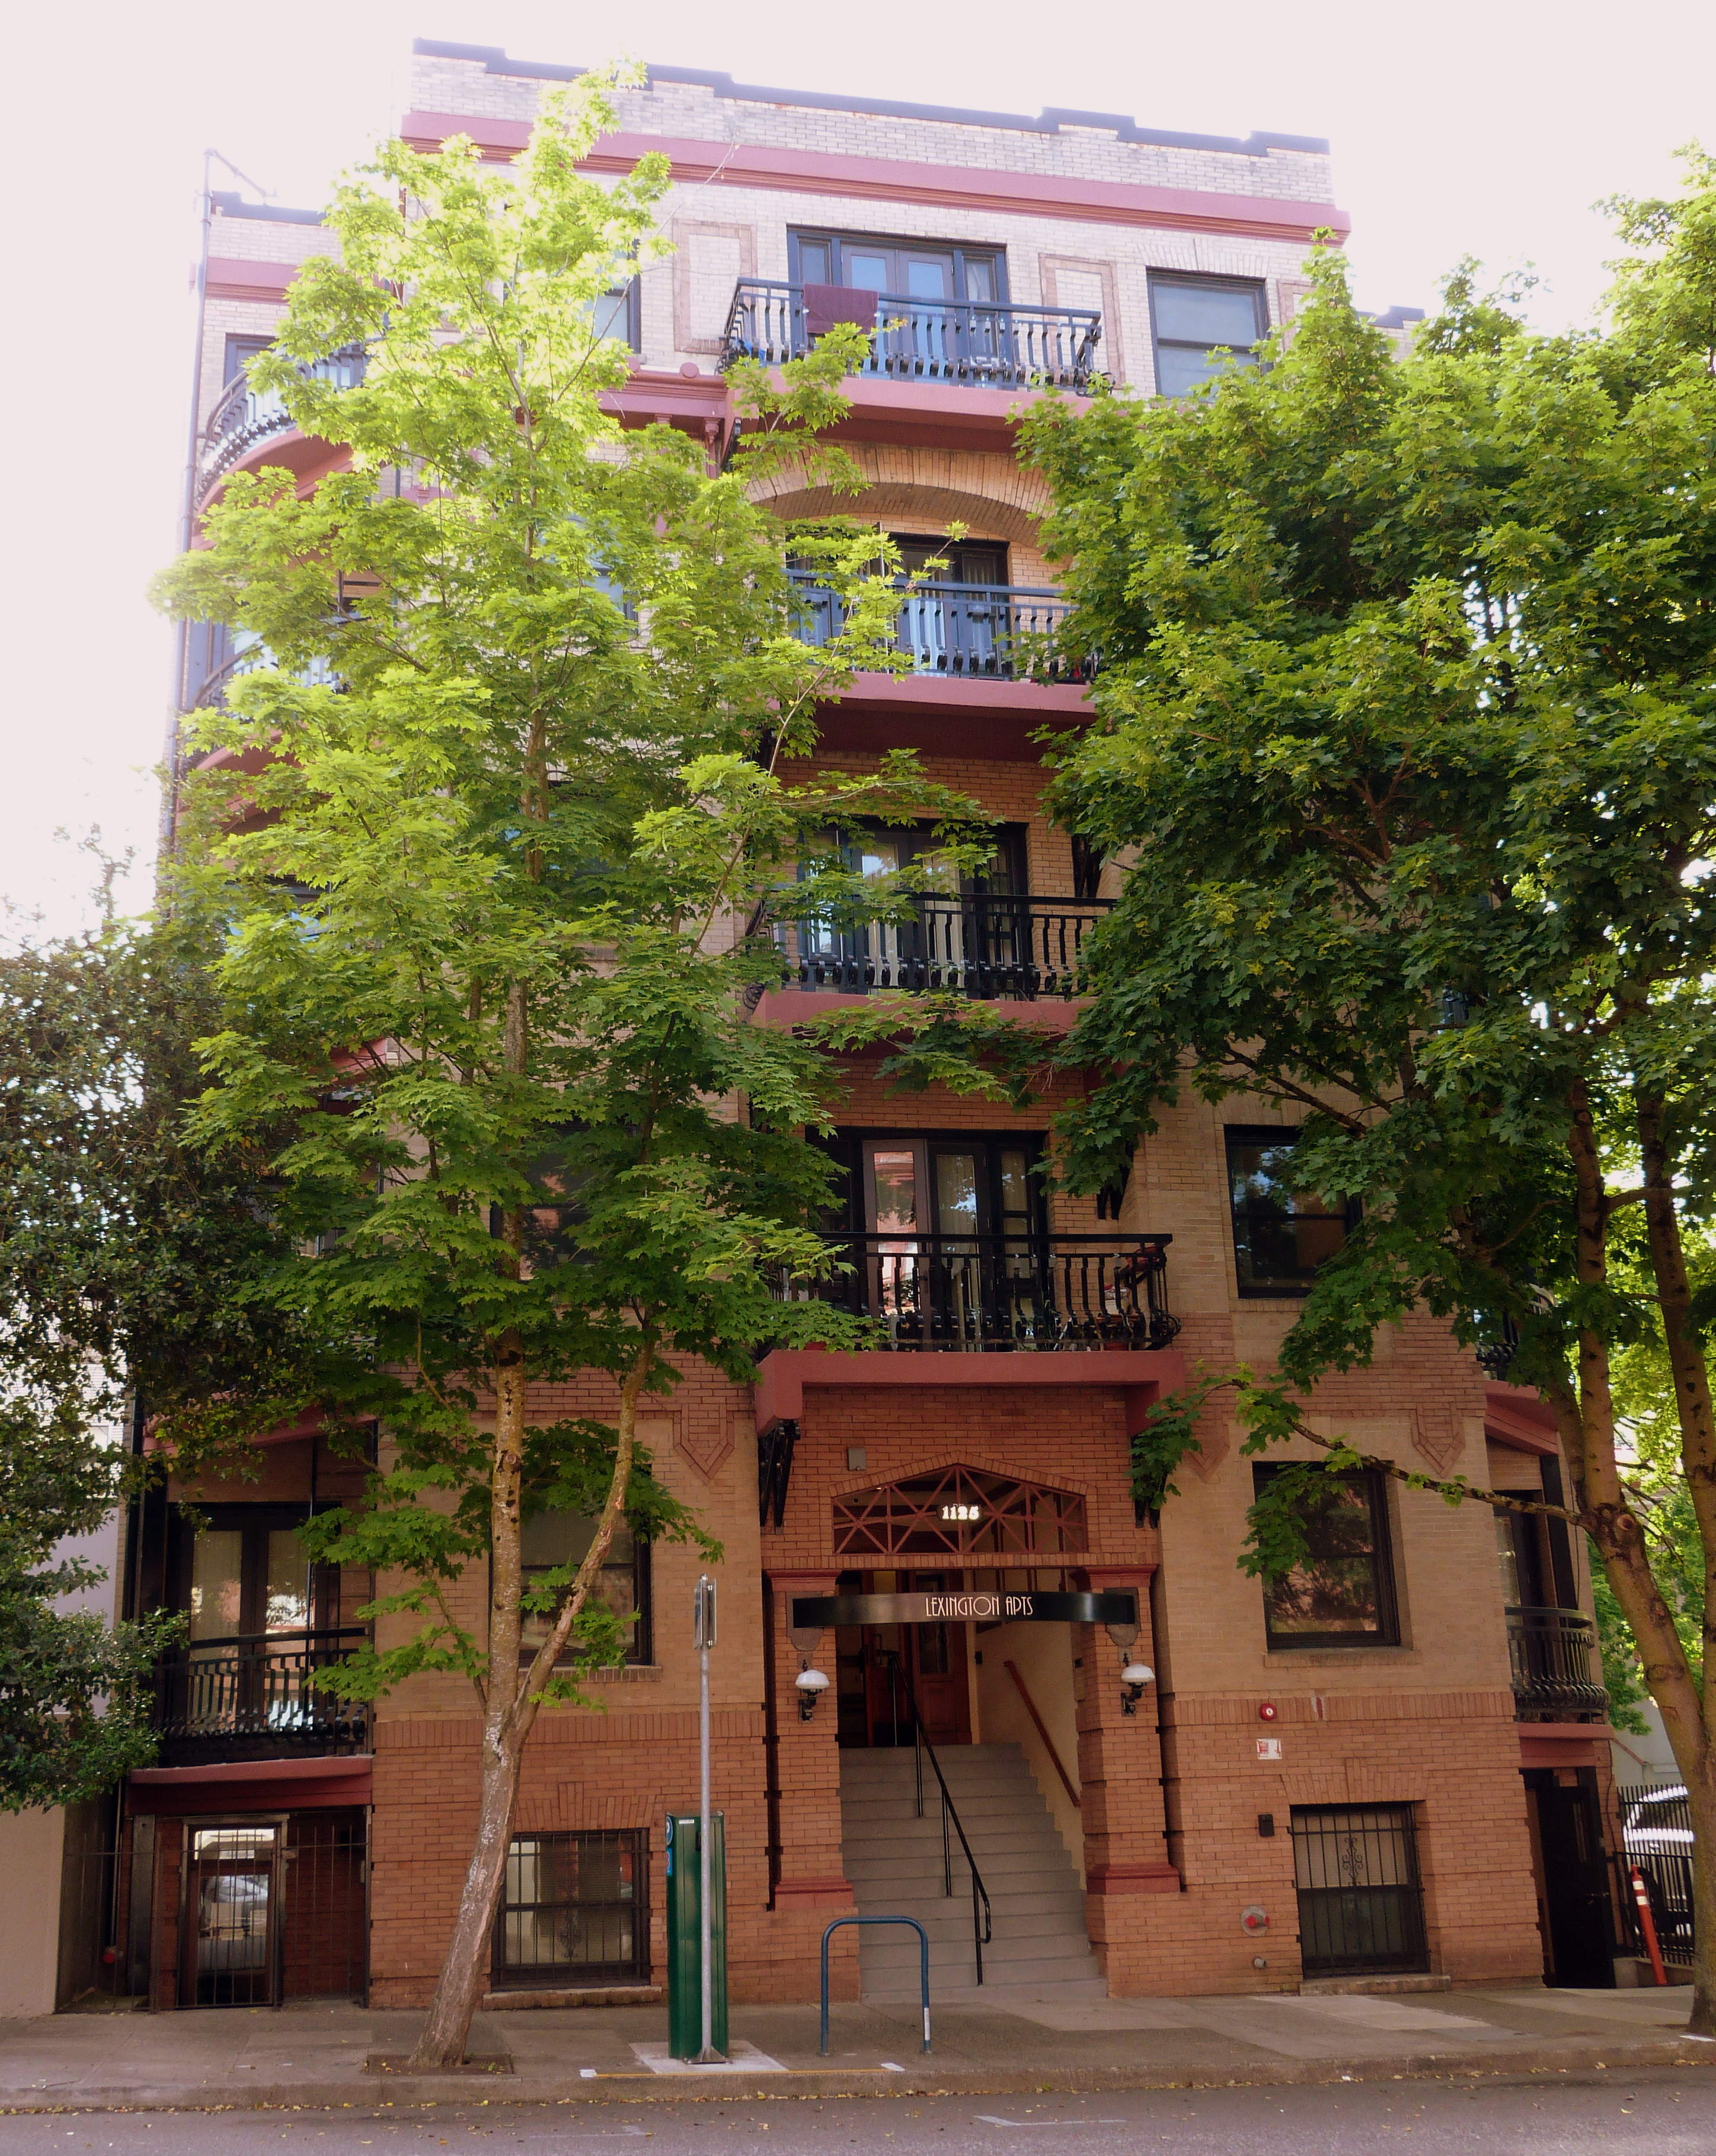 File Hanthorn Apartments Portland Oregon Jpg